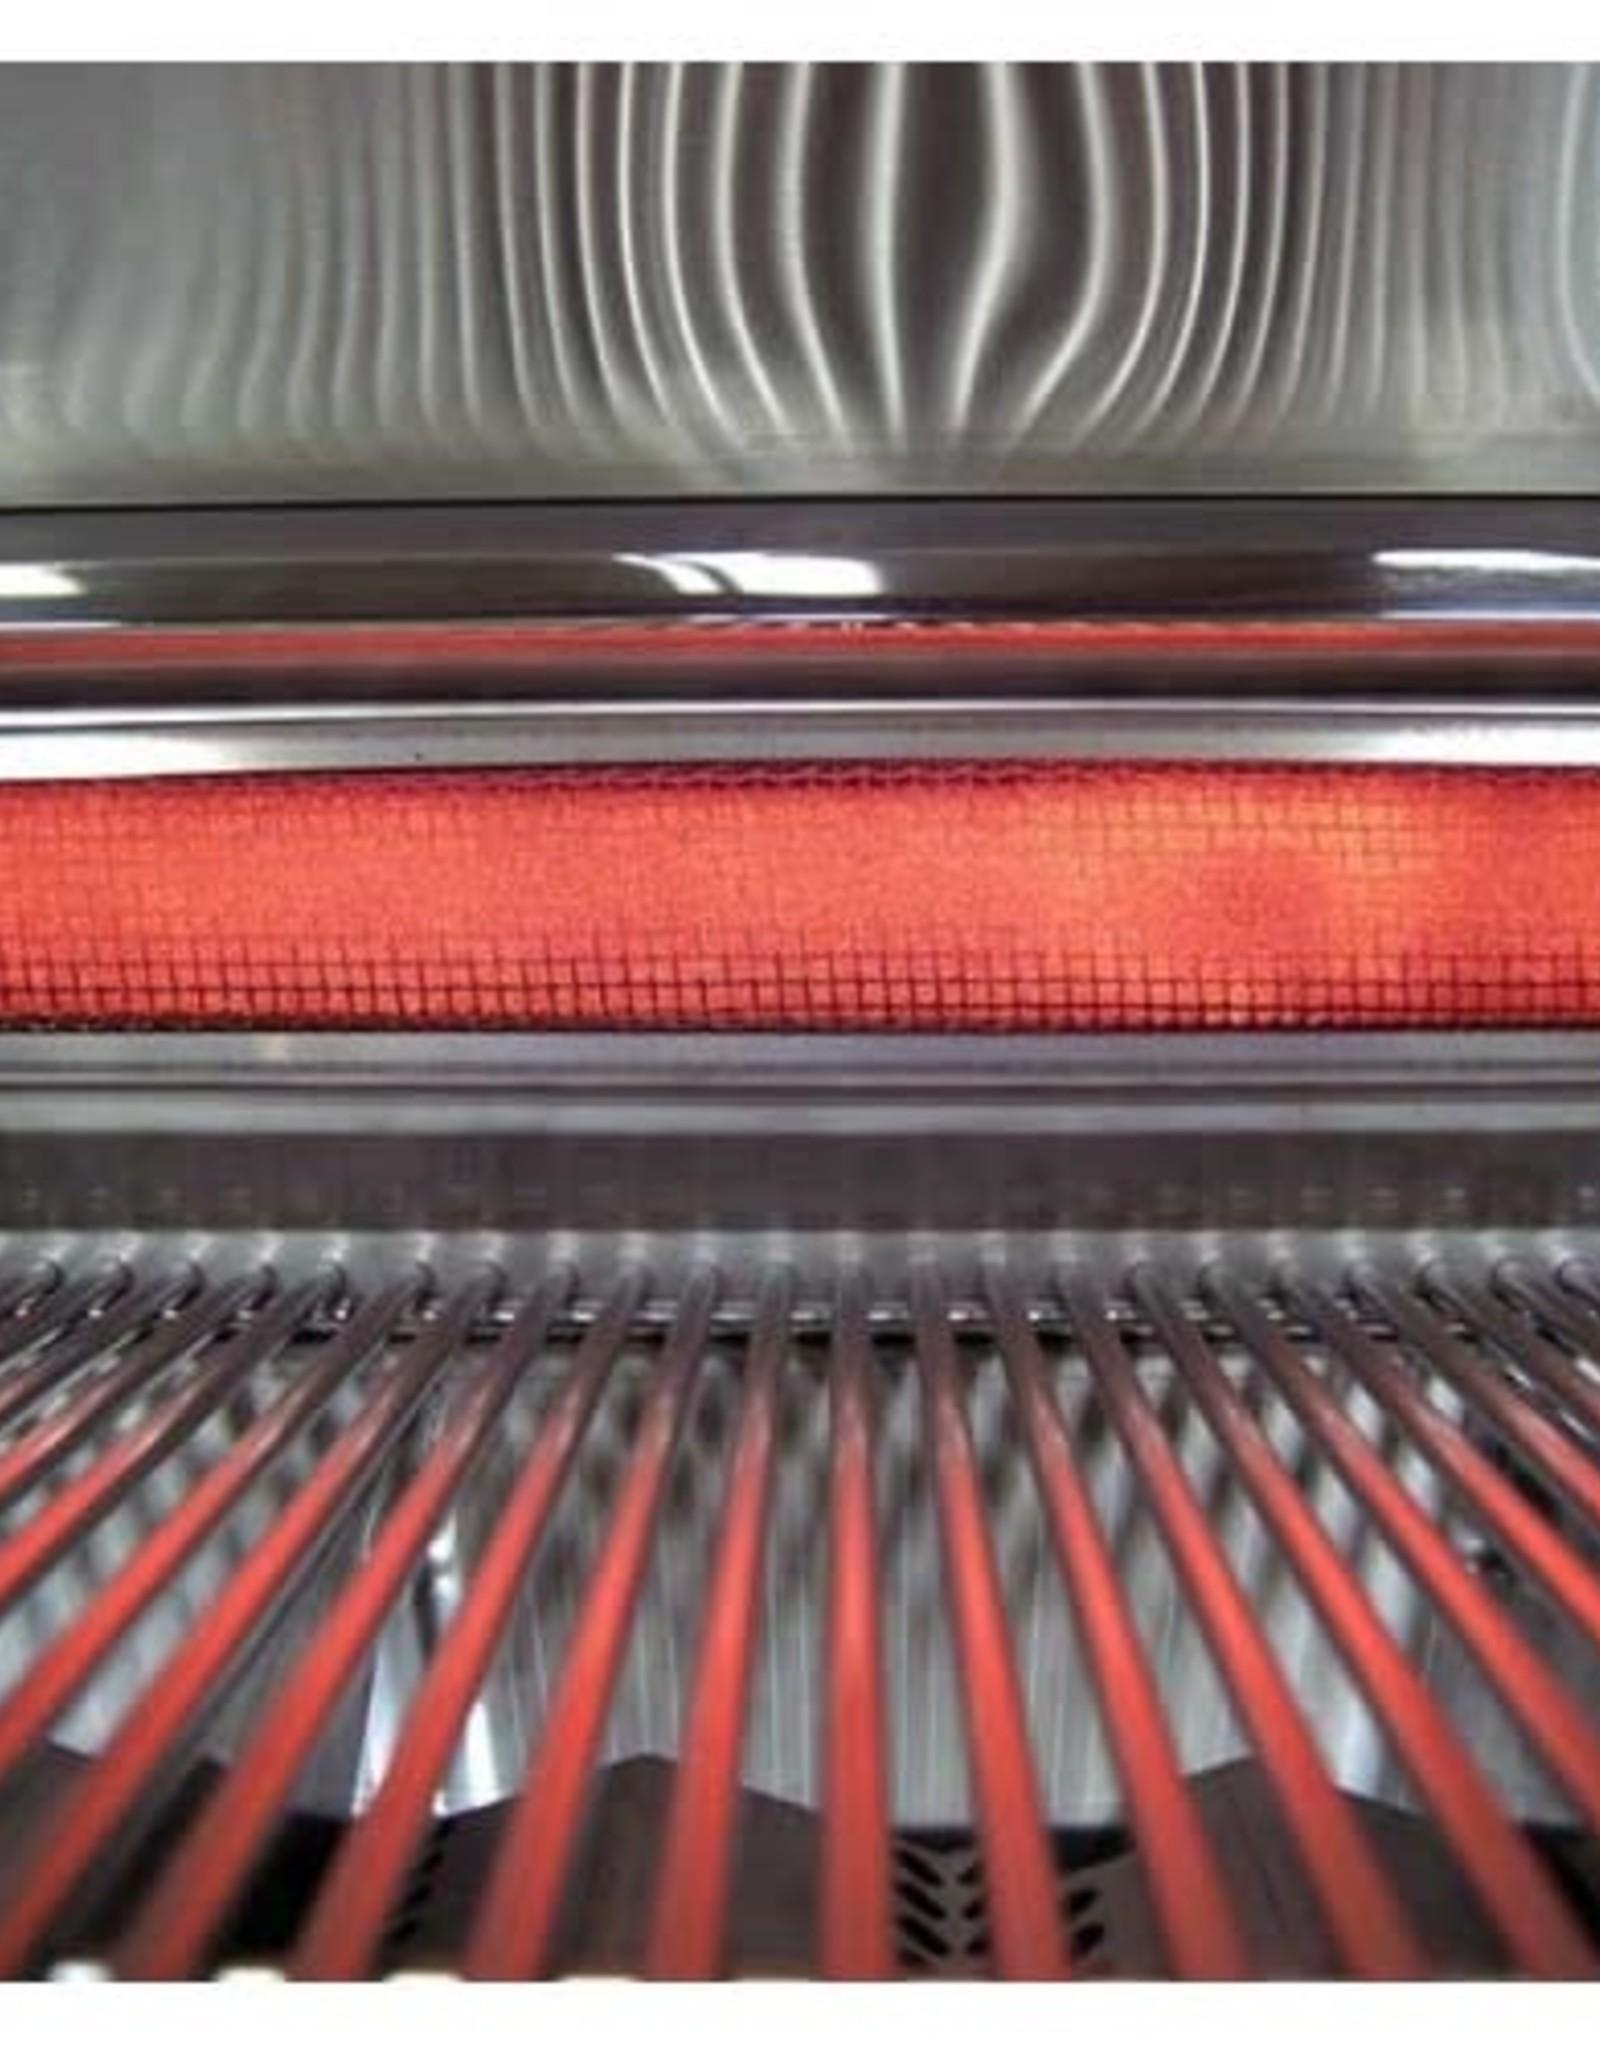 Fire Magic Fire Magic - Echelon Diamond E1060s 48-inch Cabinet Cart Grill with Power Burner (Analog)